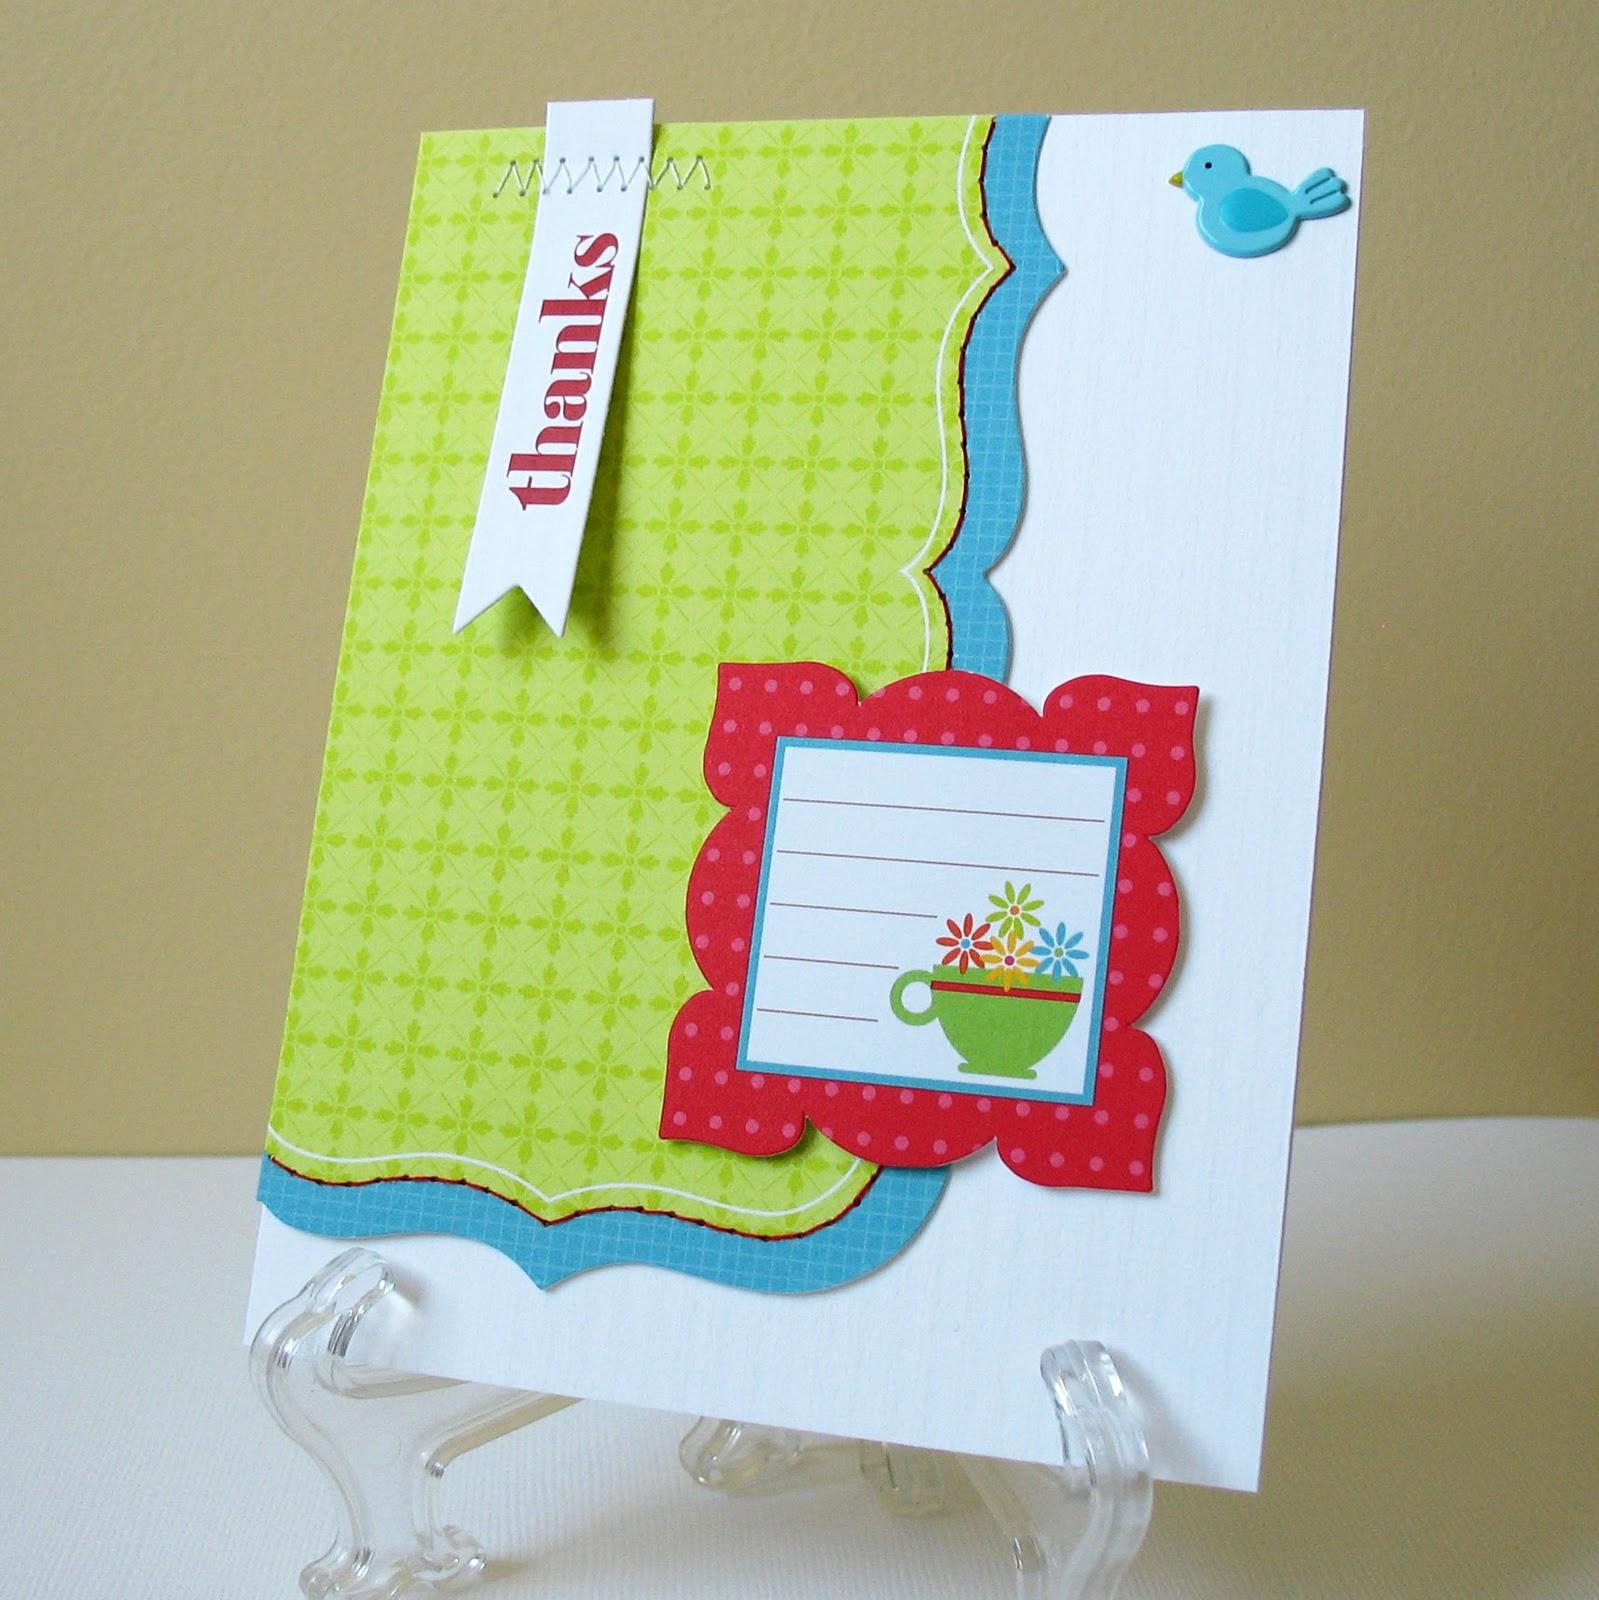 World Card Making Day Warm Up. Pinterest Christmas Card Making Ideas ...